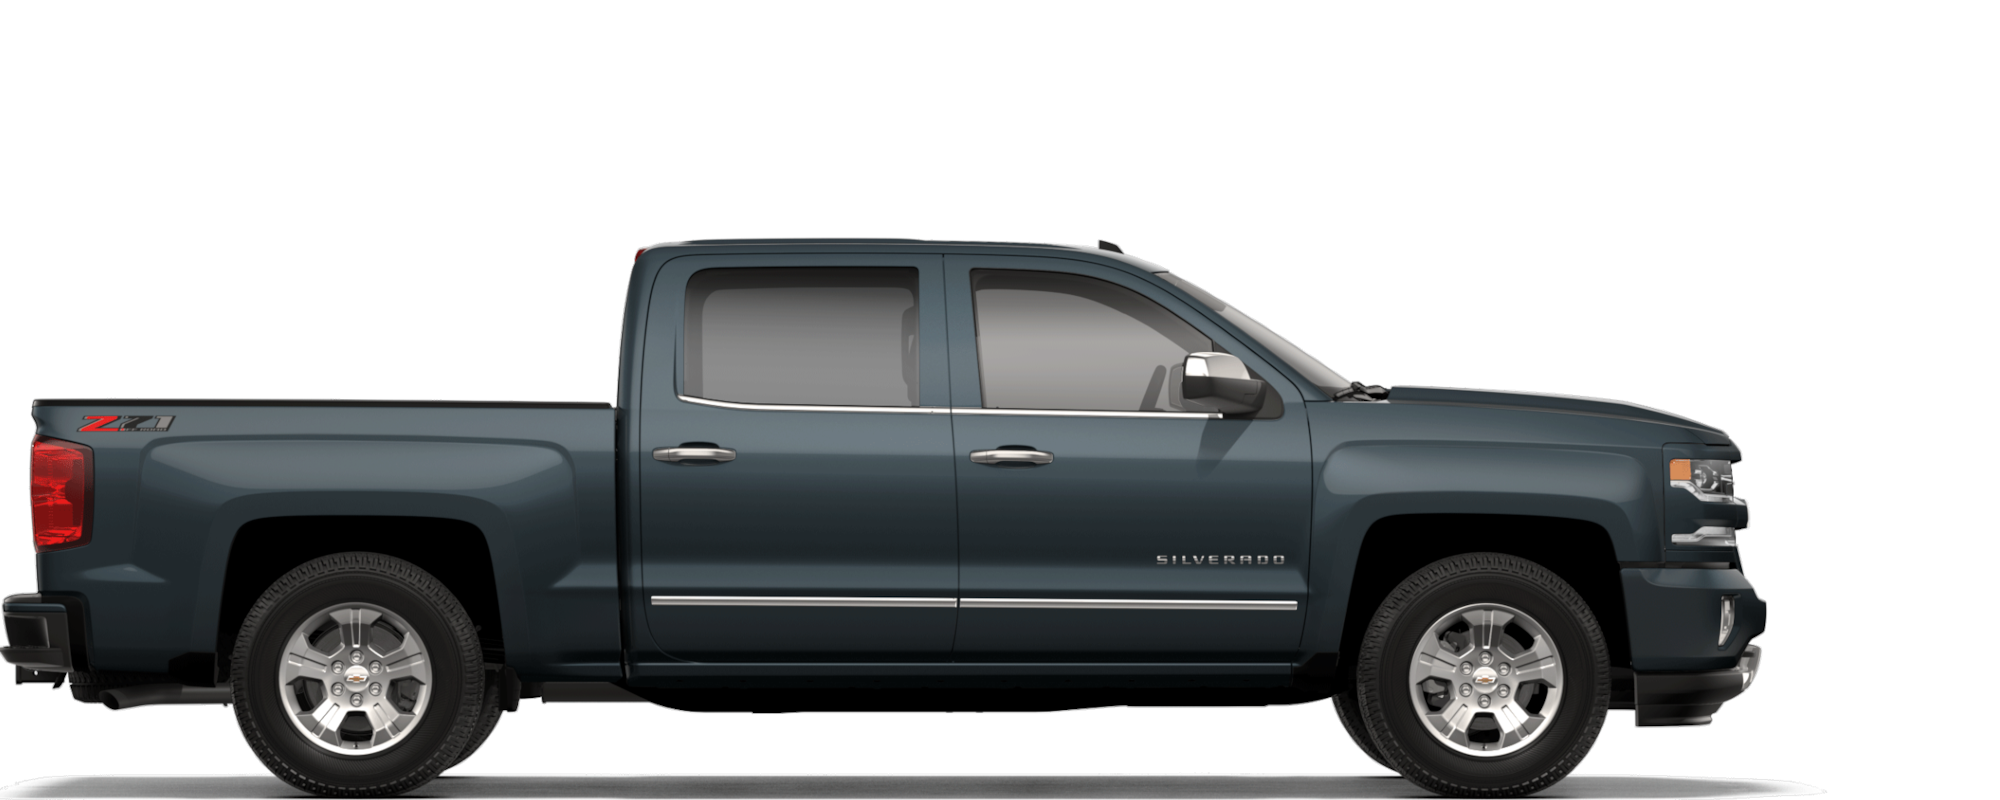 Engine Diagram For 2000 Chevrolet Pick Up Schematic Wiring Diagrams Belt Duramax Diesel 3500 2018 Silverado 1500 Pickup Truck Rh Com 2014 Chevy Colors 2001